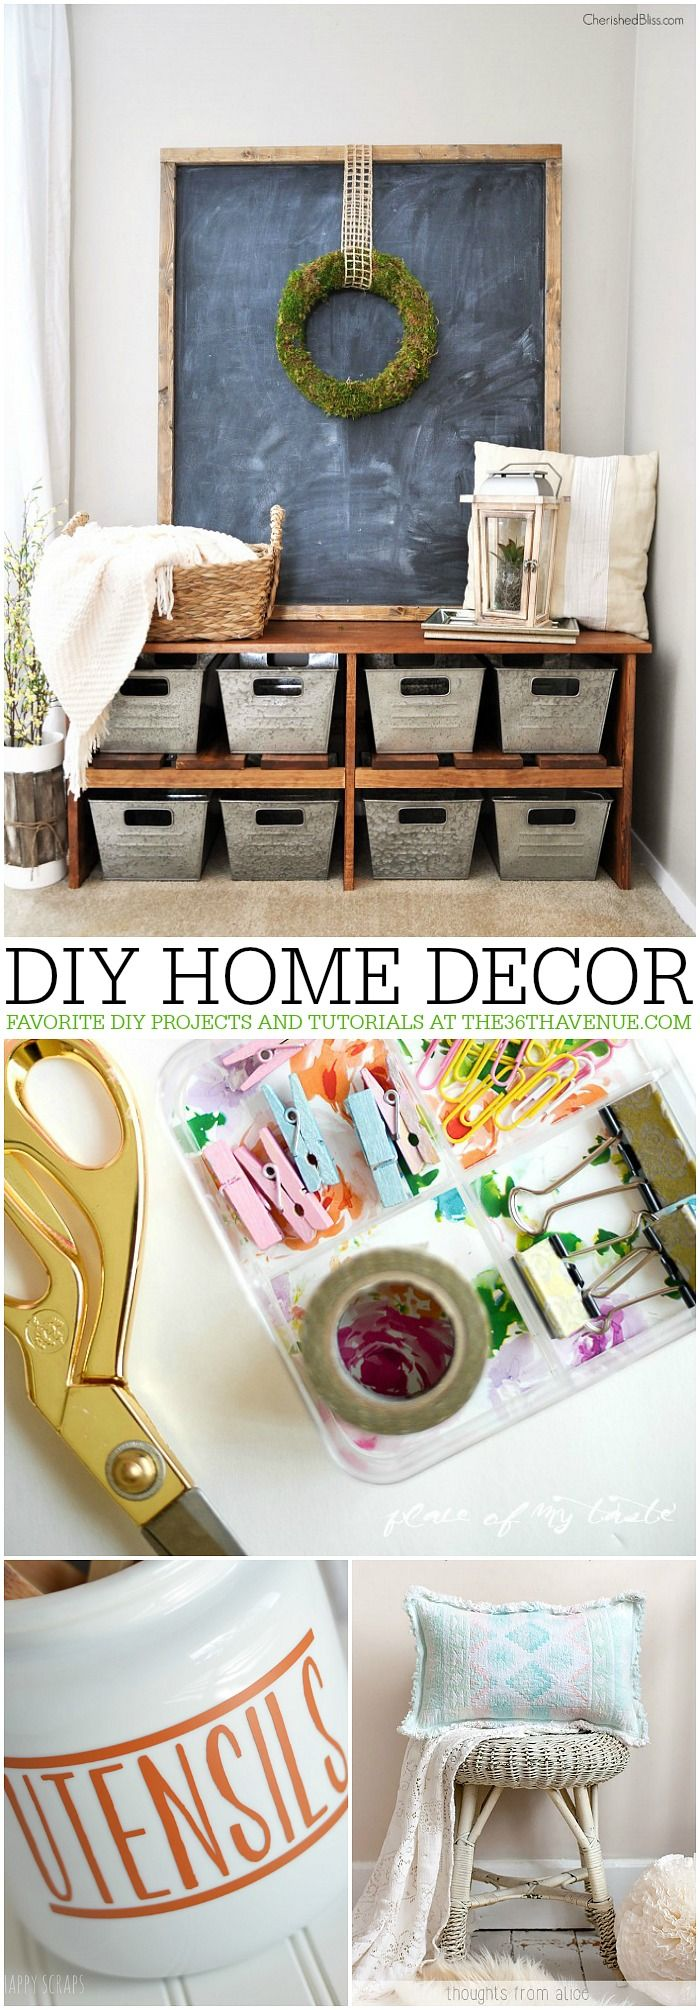 Best 25 Decorative items ideas on Pinterest House decoration